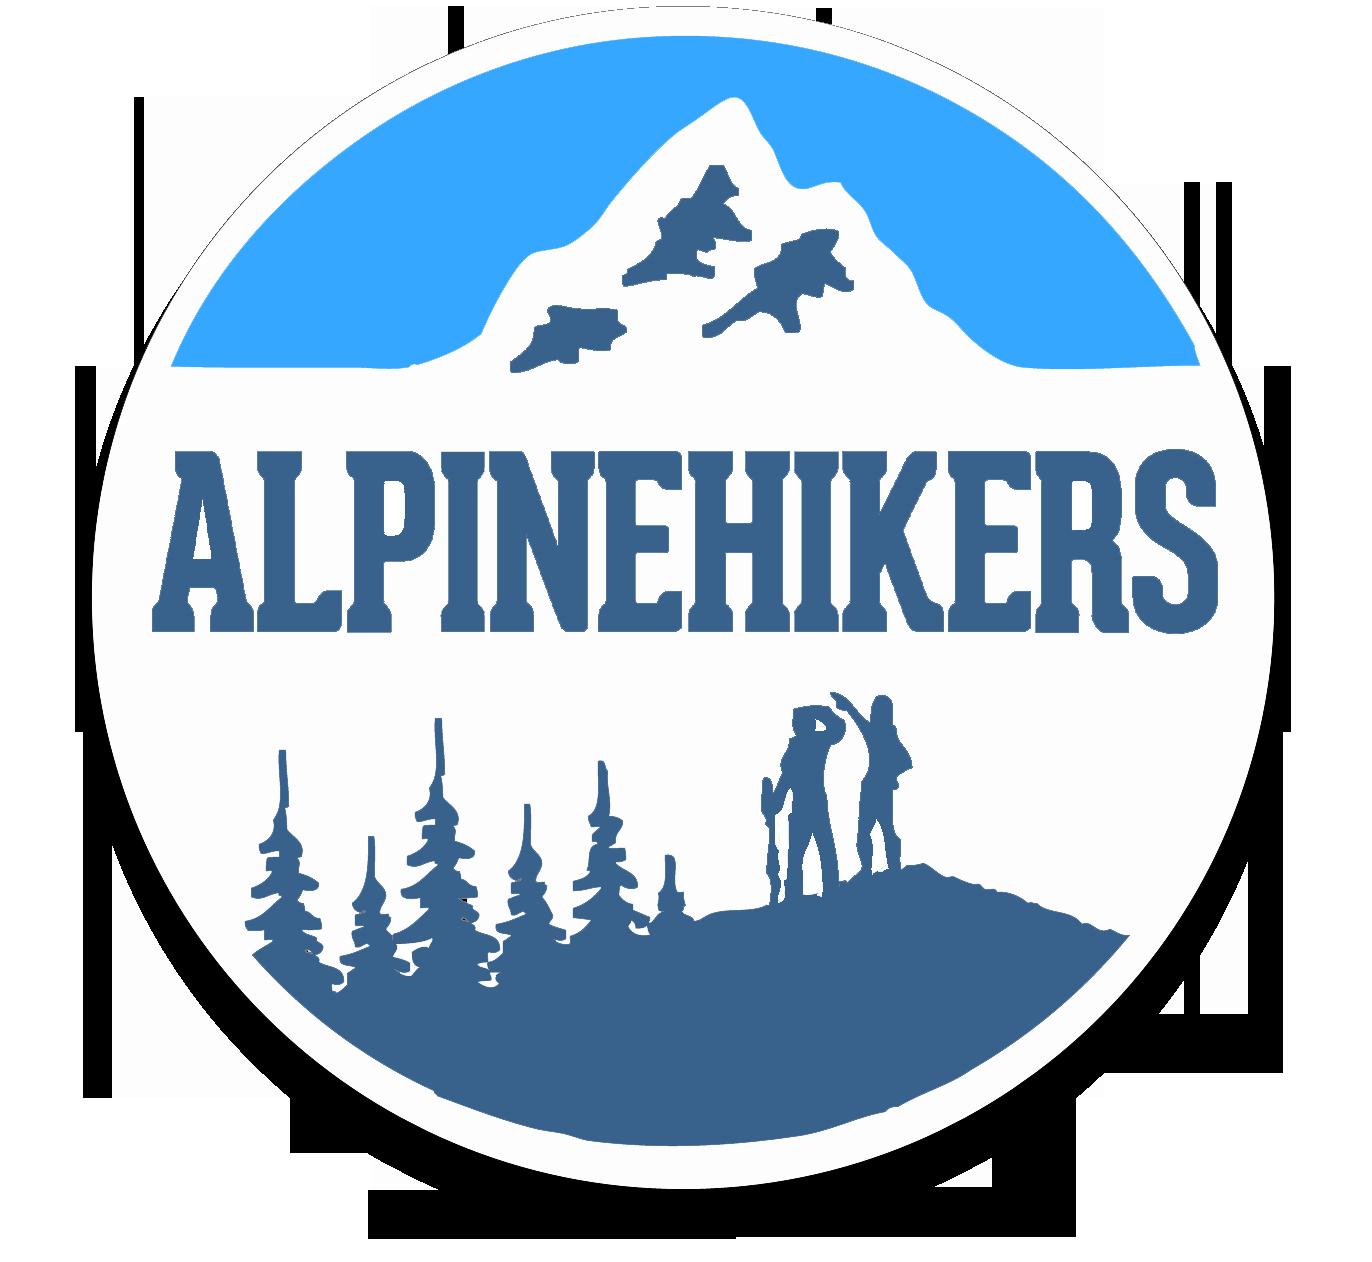 Alpinehikers Alpinehikers Hiking Tours in Switzerland